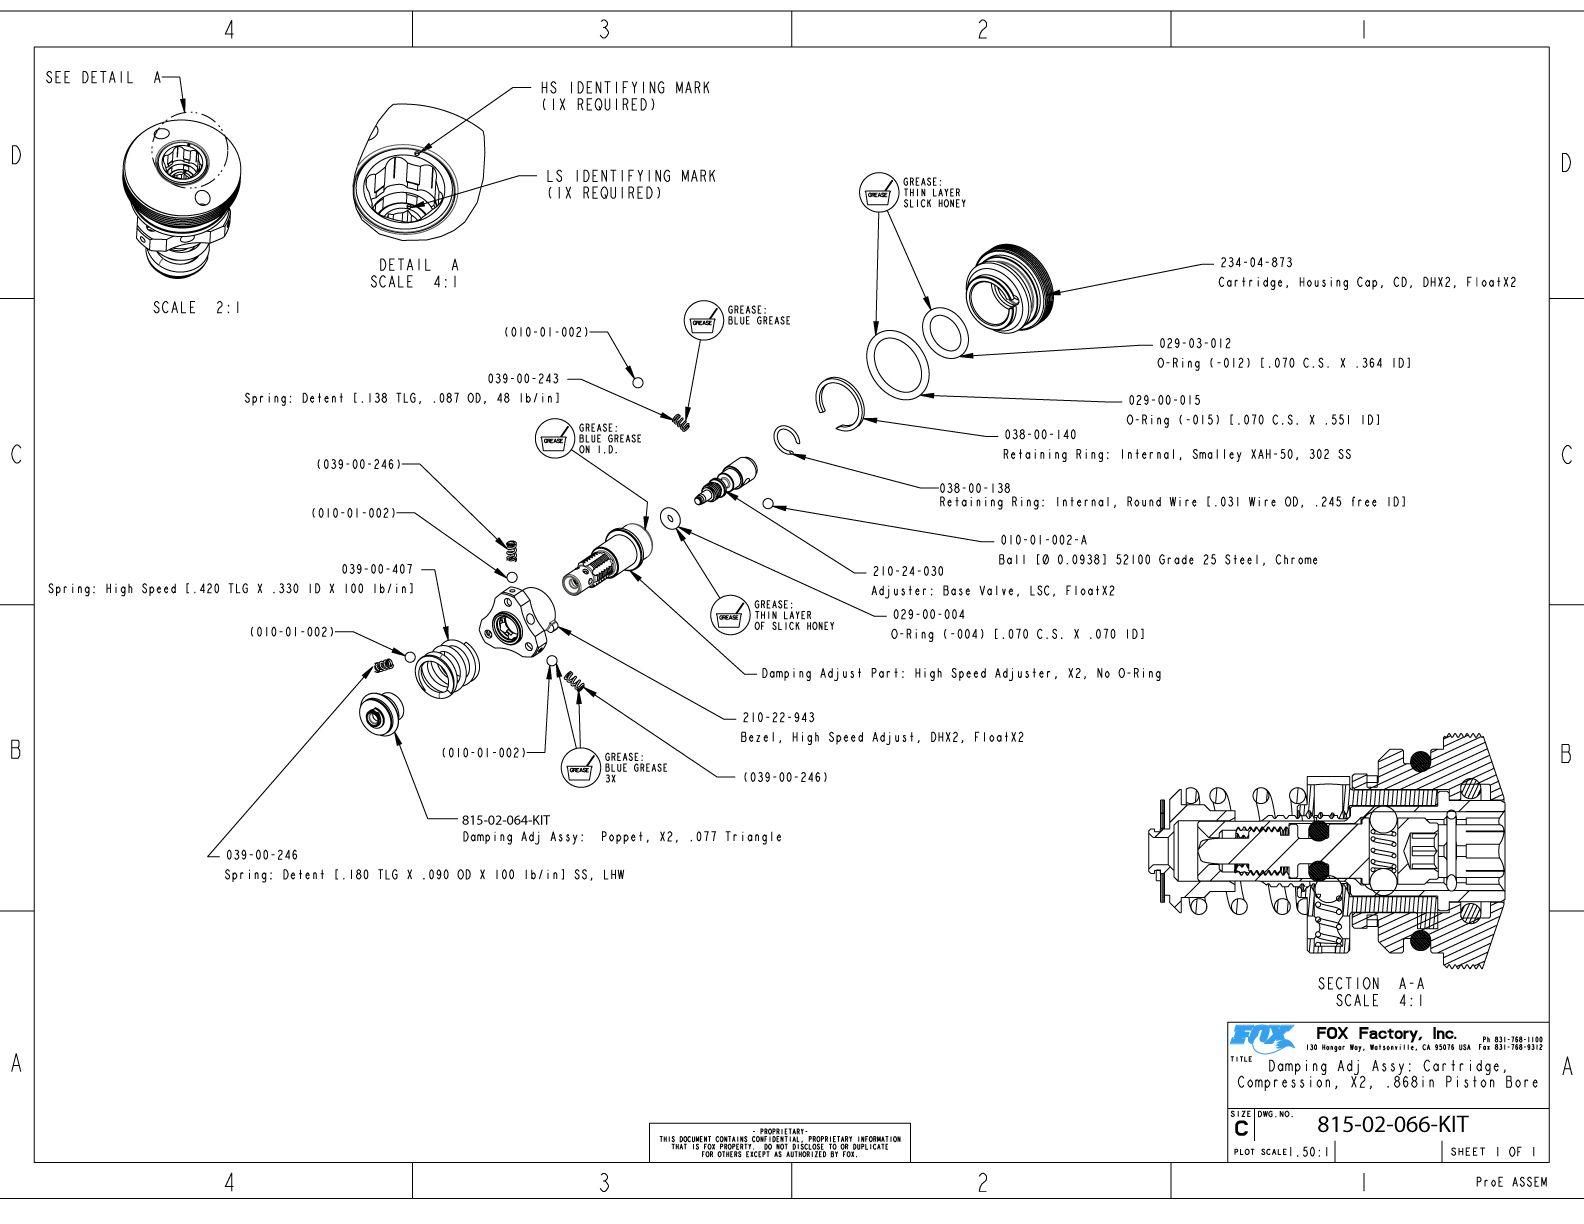 Float X2 Part Information Bike Help Center Fox No 250 15 255 8 260 4 261 5 815 02 066 Kit Damping Adj Assy Cartridge Compression 868in Bore Piston